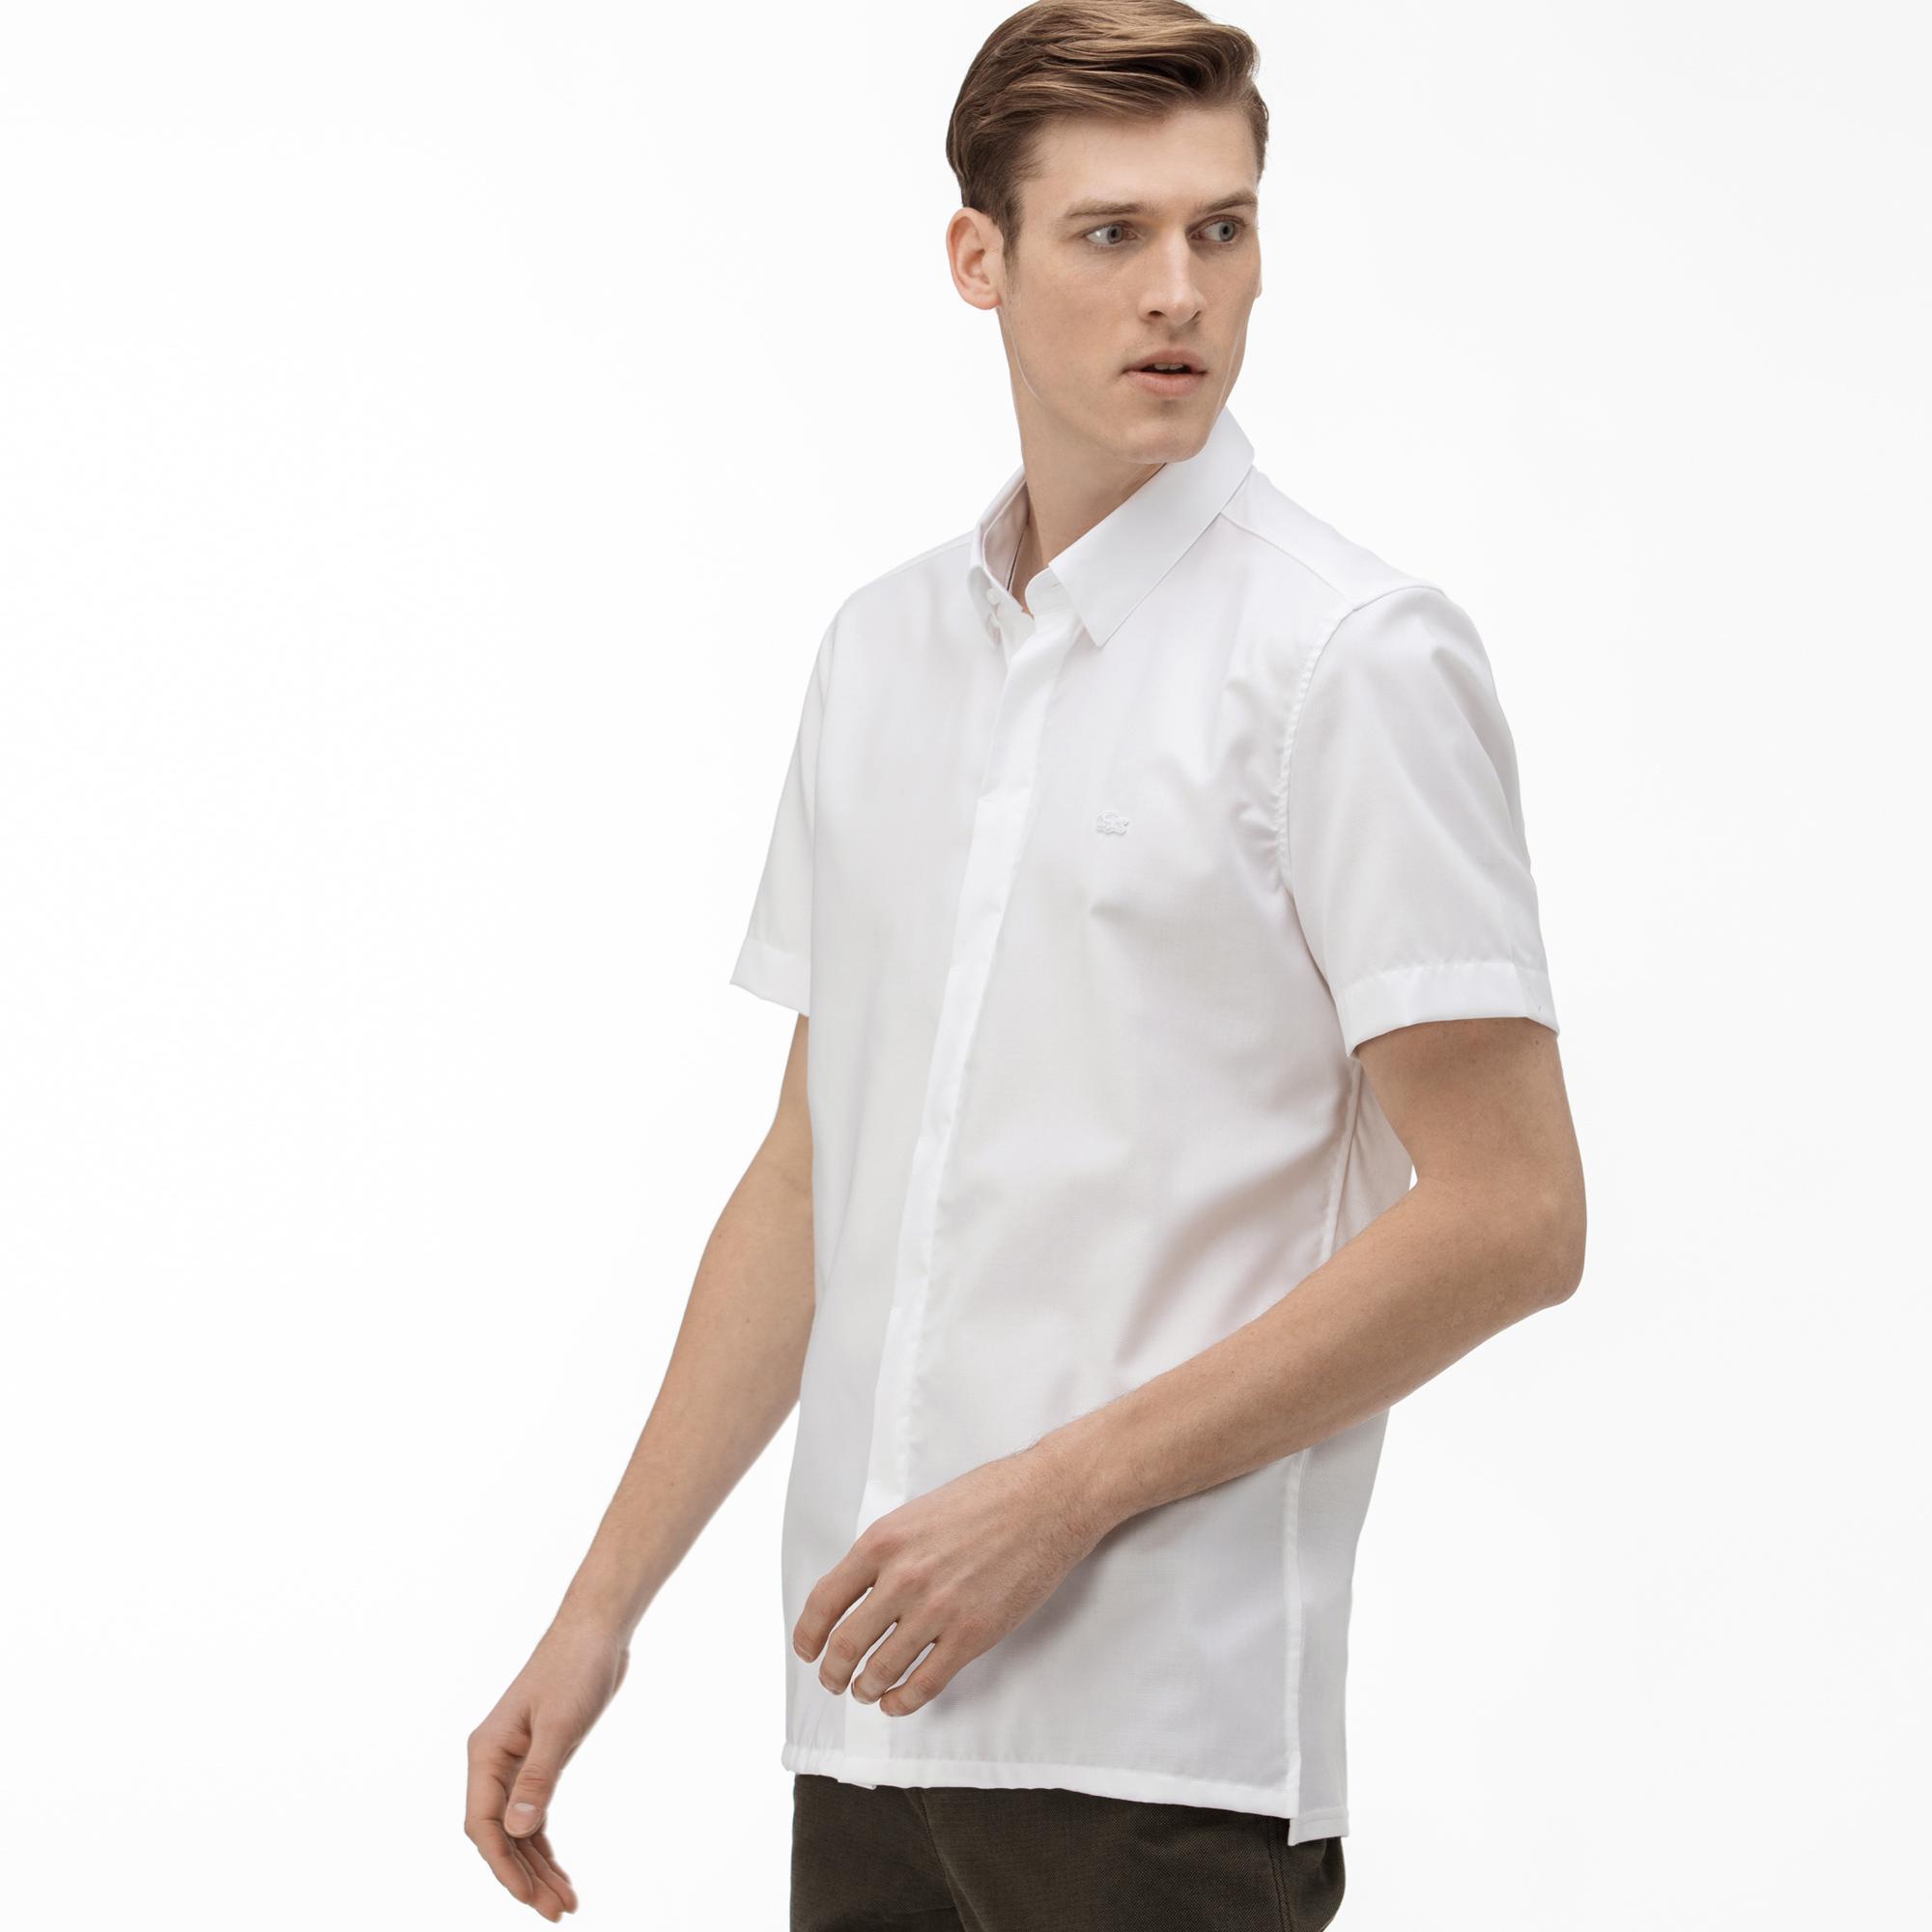 Lacoste Men's Slim Fit Short Sleeve Shirt